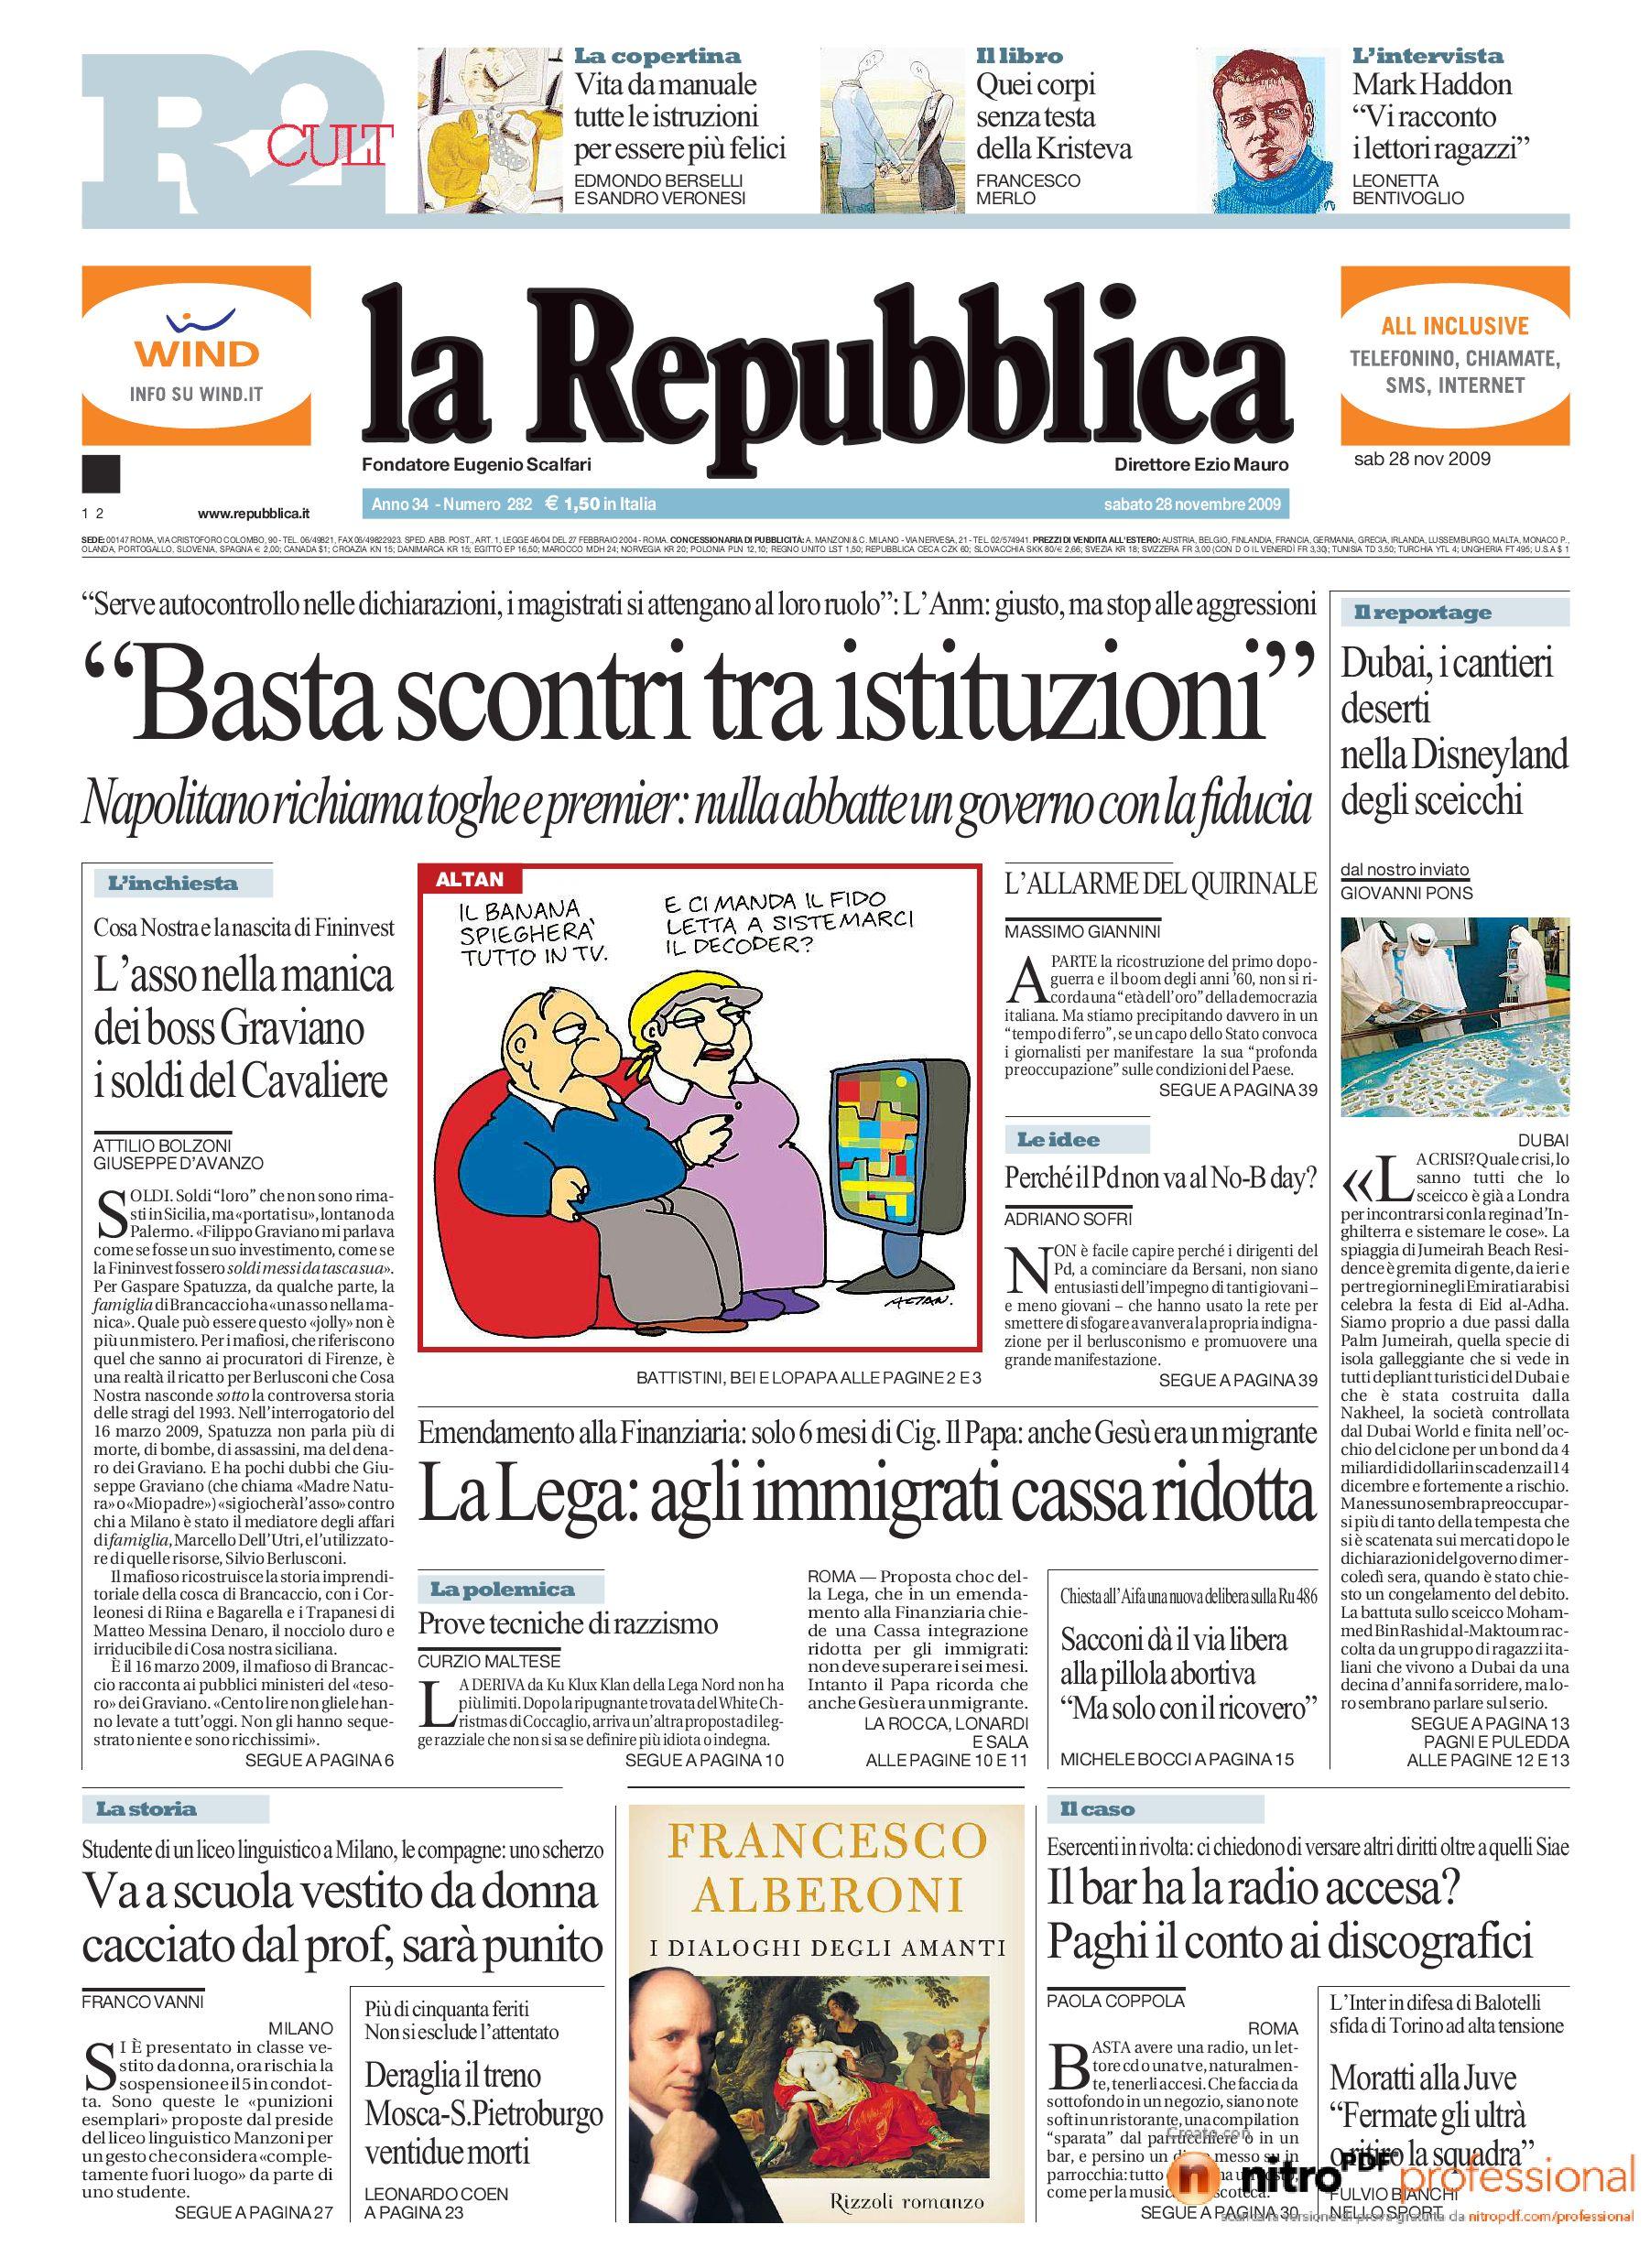 Repubblica - 28 novebre by Federico Pignalberi - issuu b80a5ea41a5